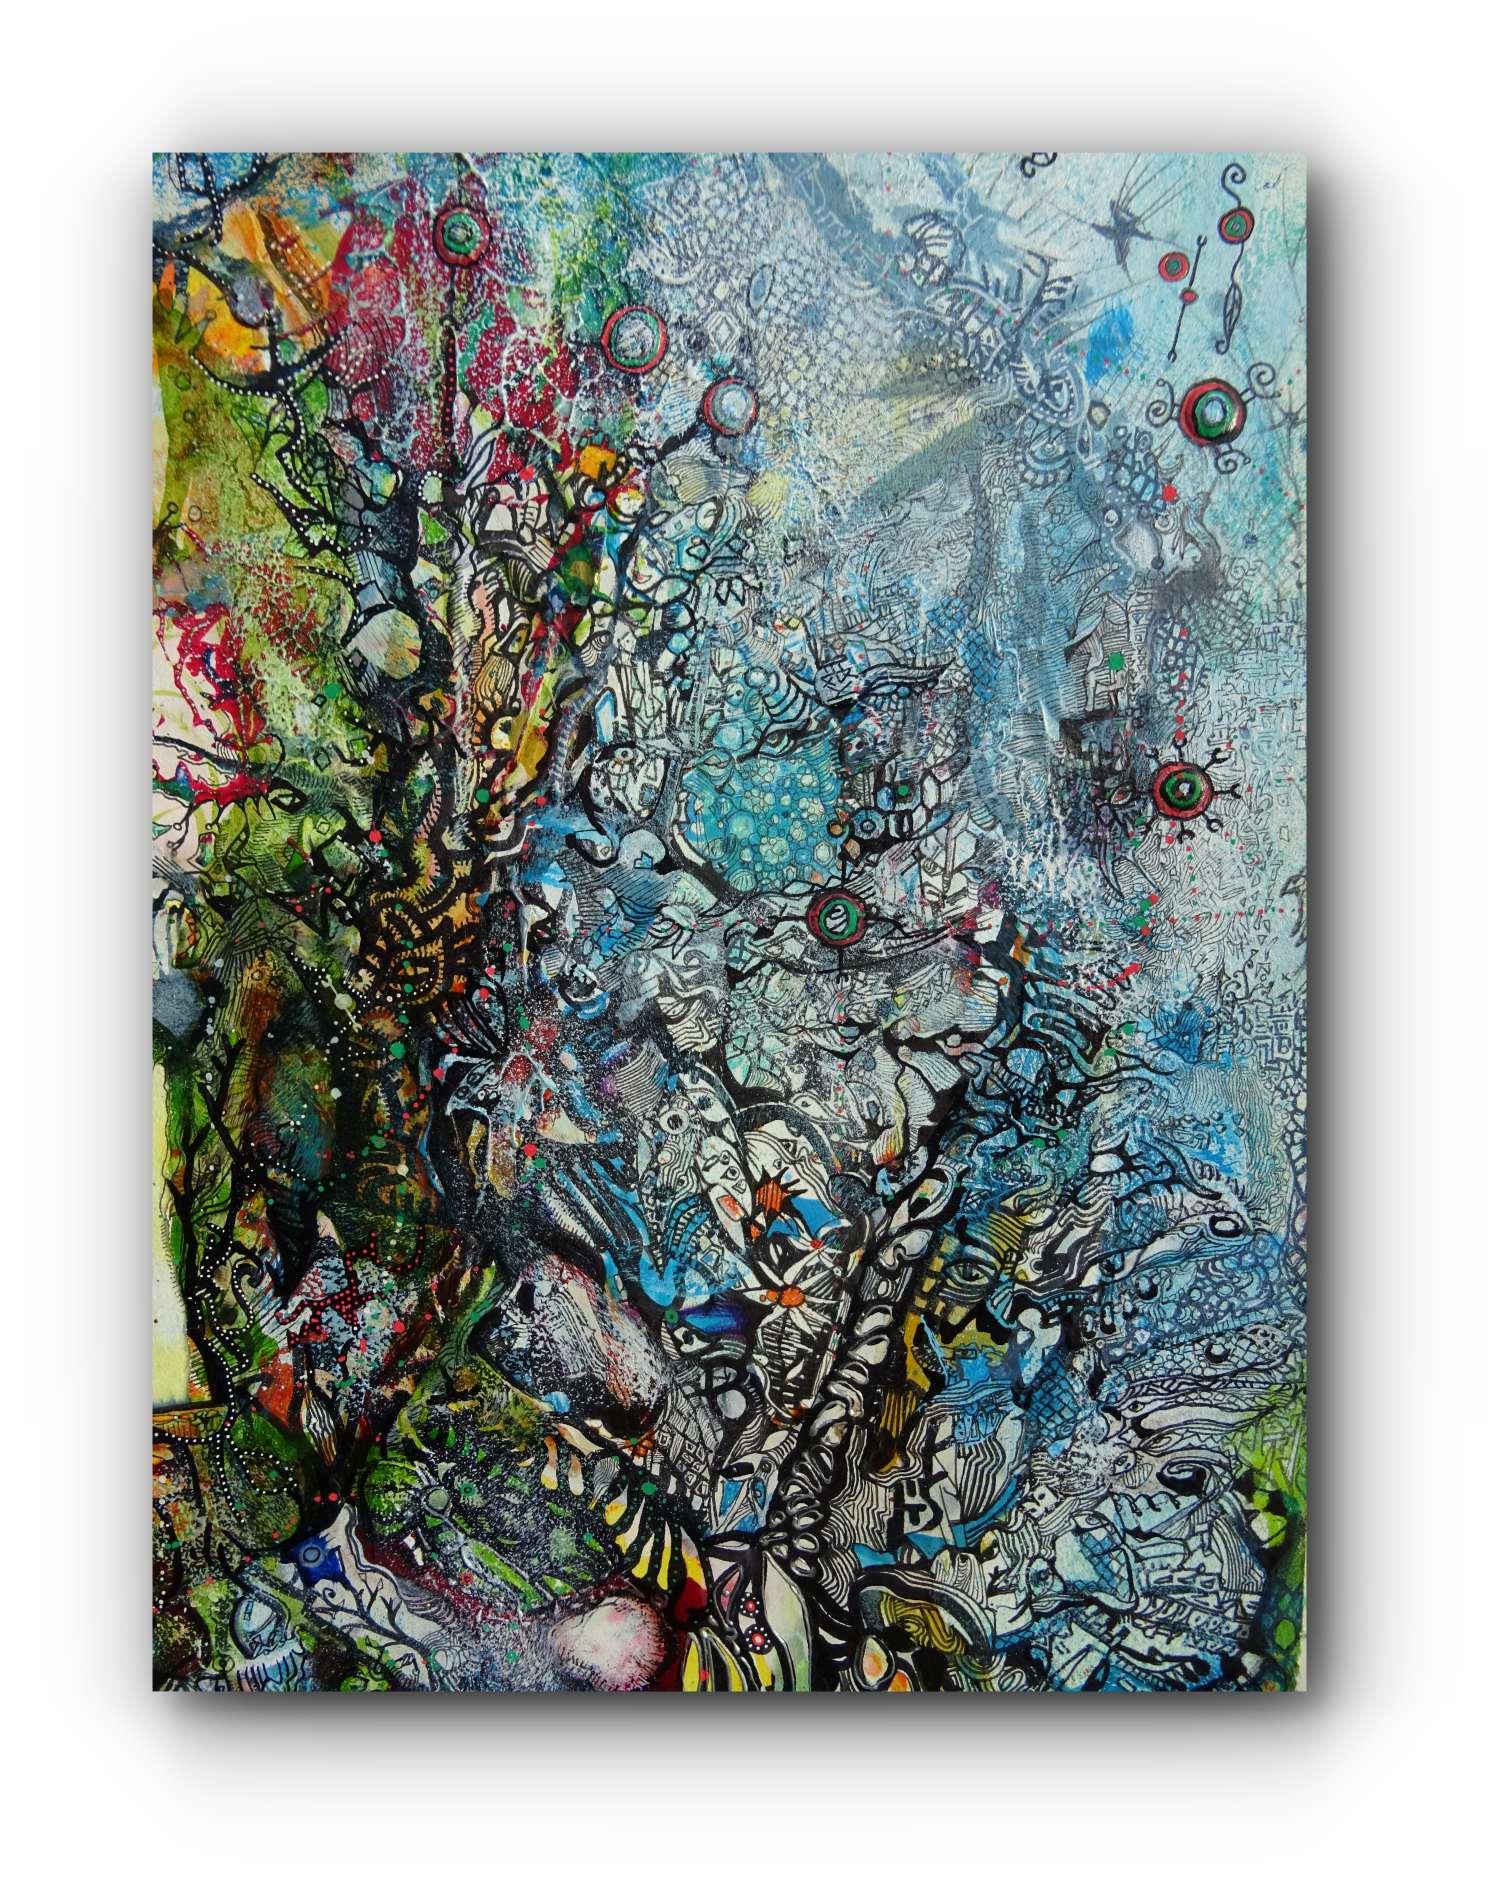 painting-detail-4-heart-forest-artists-ingress-vortices.jpg